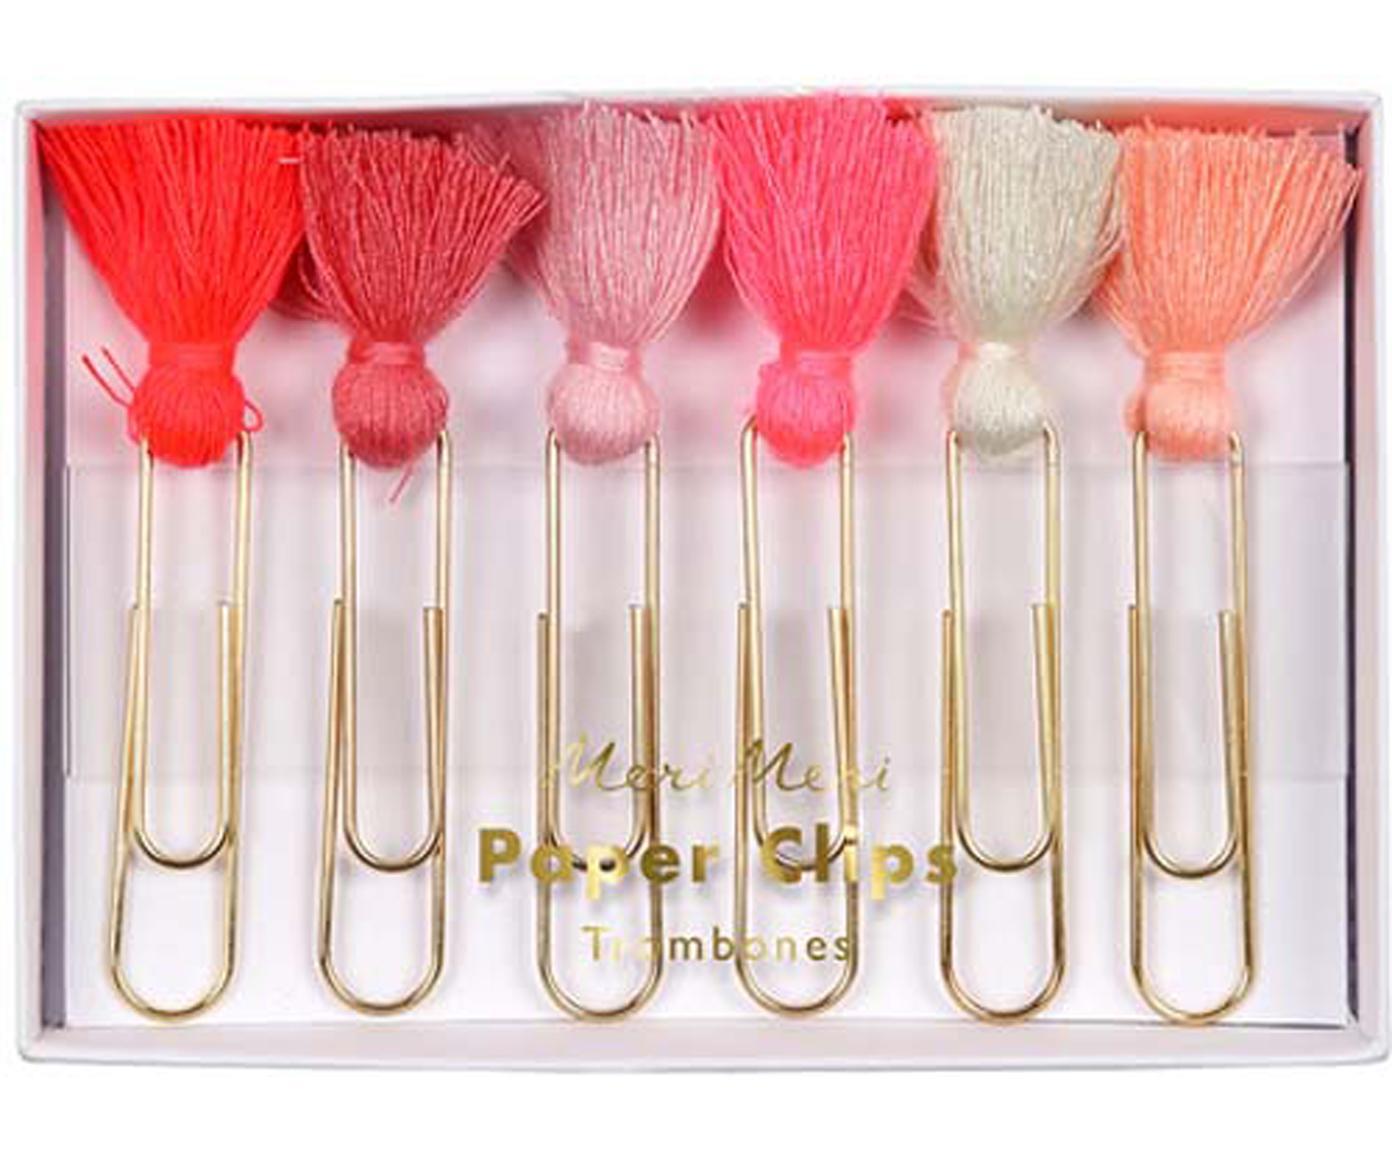 Büroklammer-Set Clippy, 6-tlg., Metall, lackiert, Polyester, Rosatöne, Rottöne, Creme, Goldfarben, 2 x 6 cm